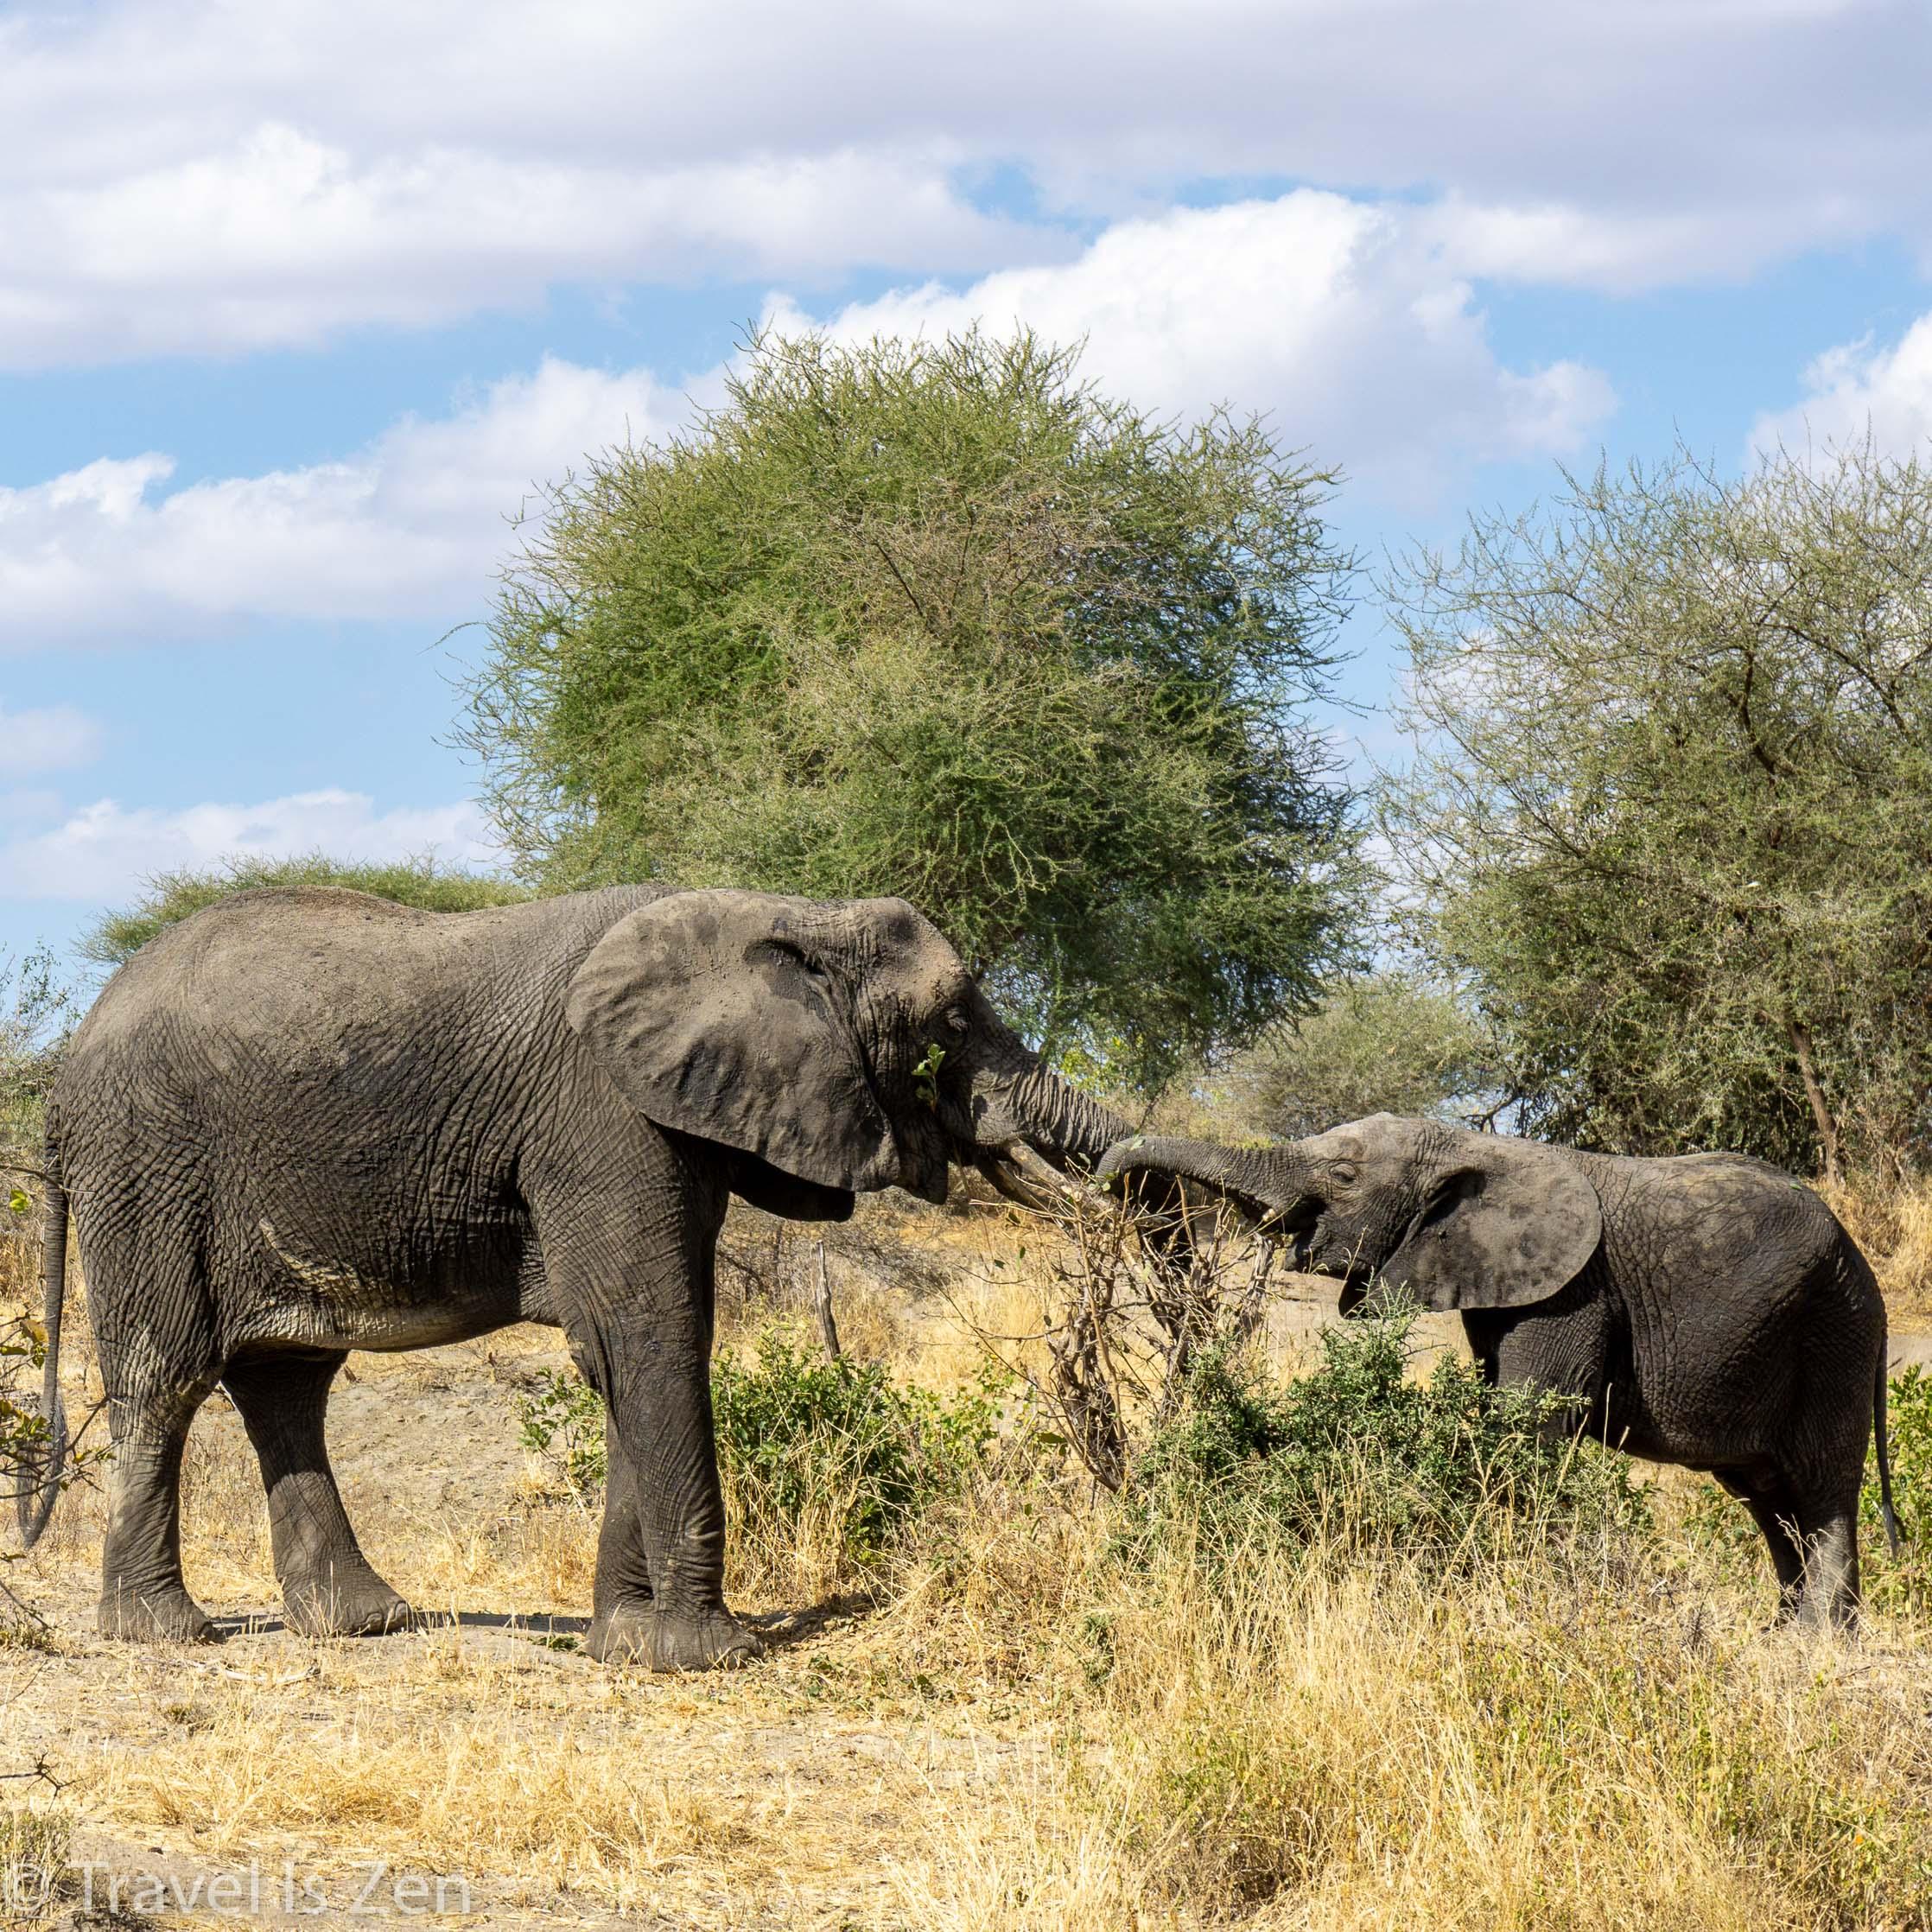 Tanzania - Moshi, Kilimanjaro, Ngorongoro Crater, Tarangire National Park, Lake Manyara